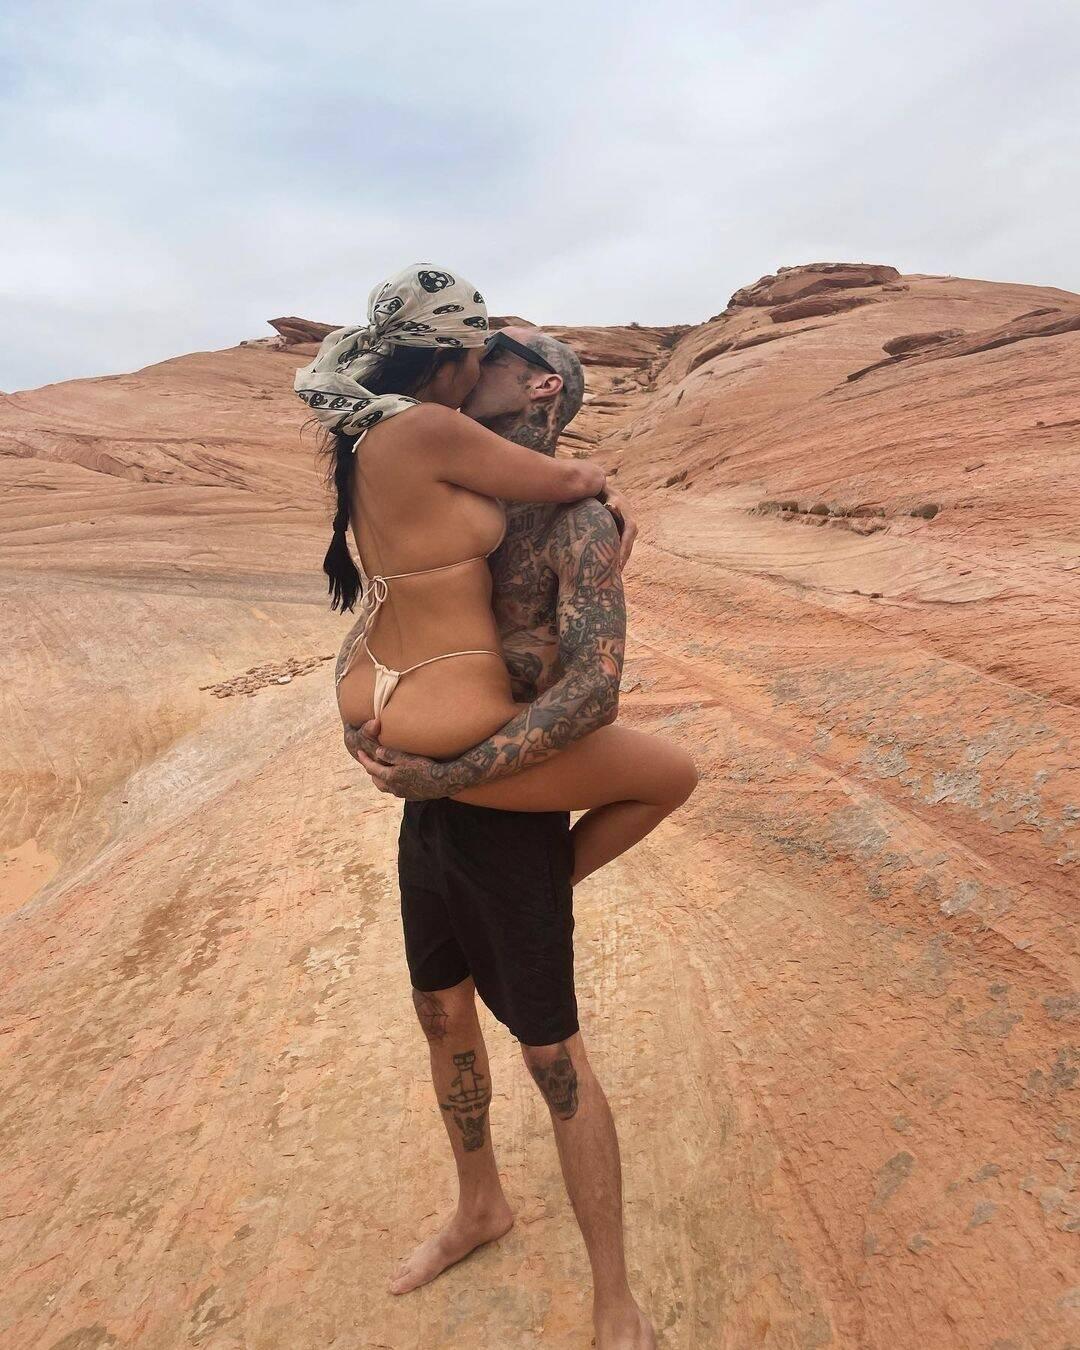 Travis Barkers Dream Getaway for Kourtney Kardashian May Be His Best Birthday Gift Yet